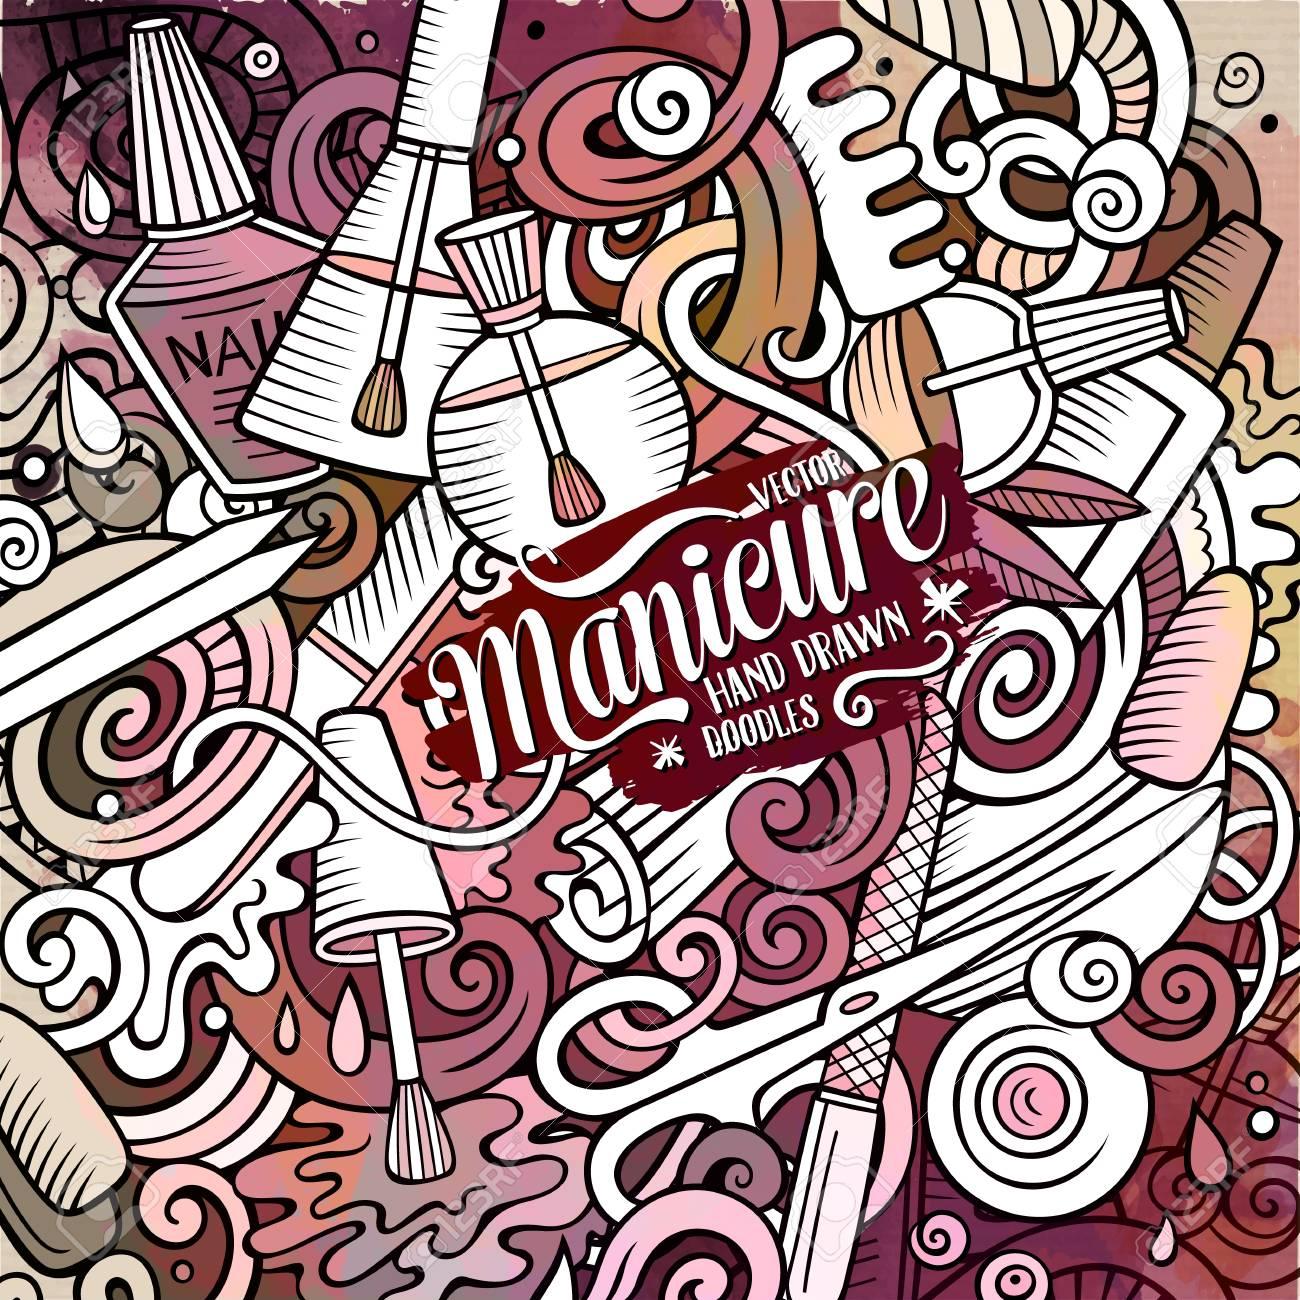 Cartoon Cute Doodles Hand Drawn Nail Salon Illustration. Watercolour ...